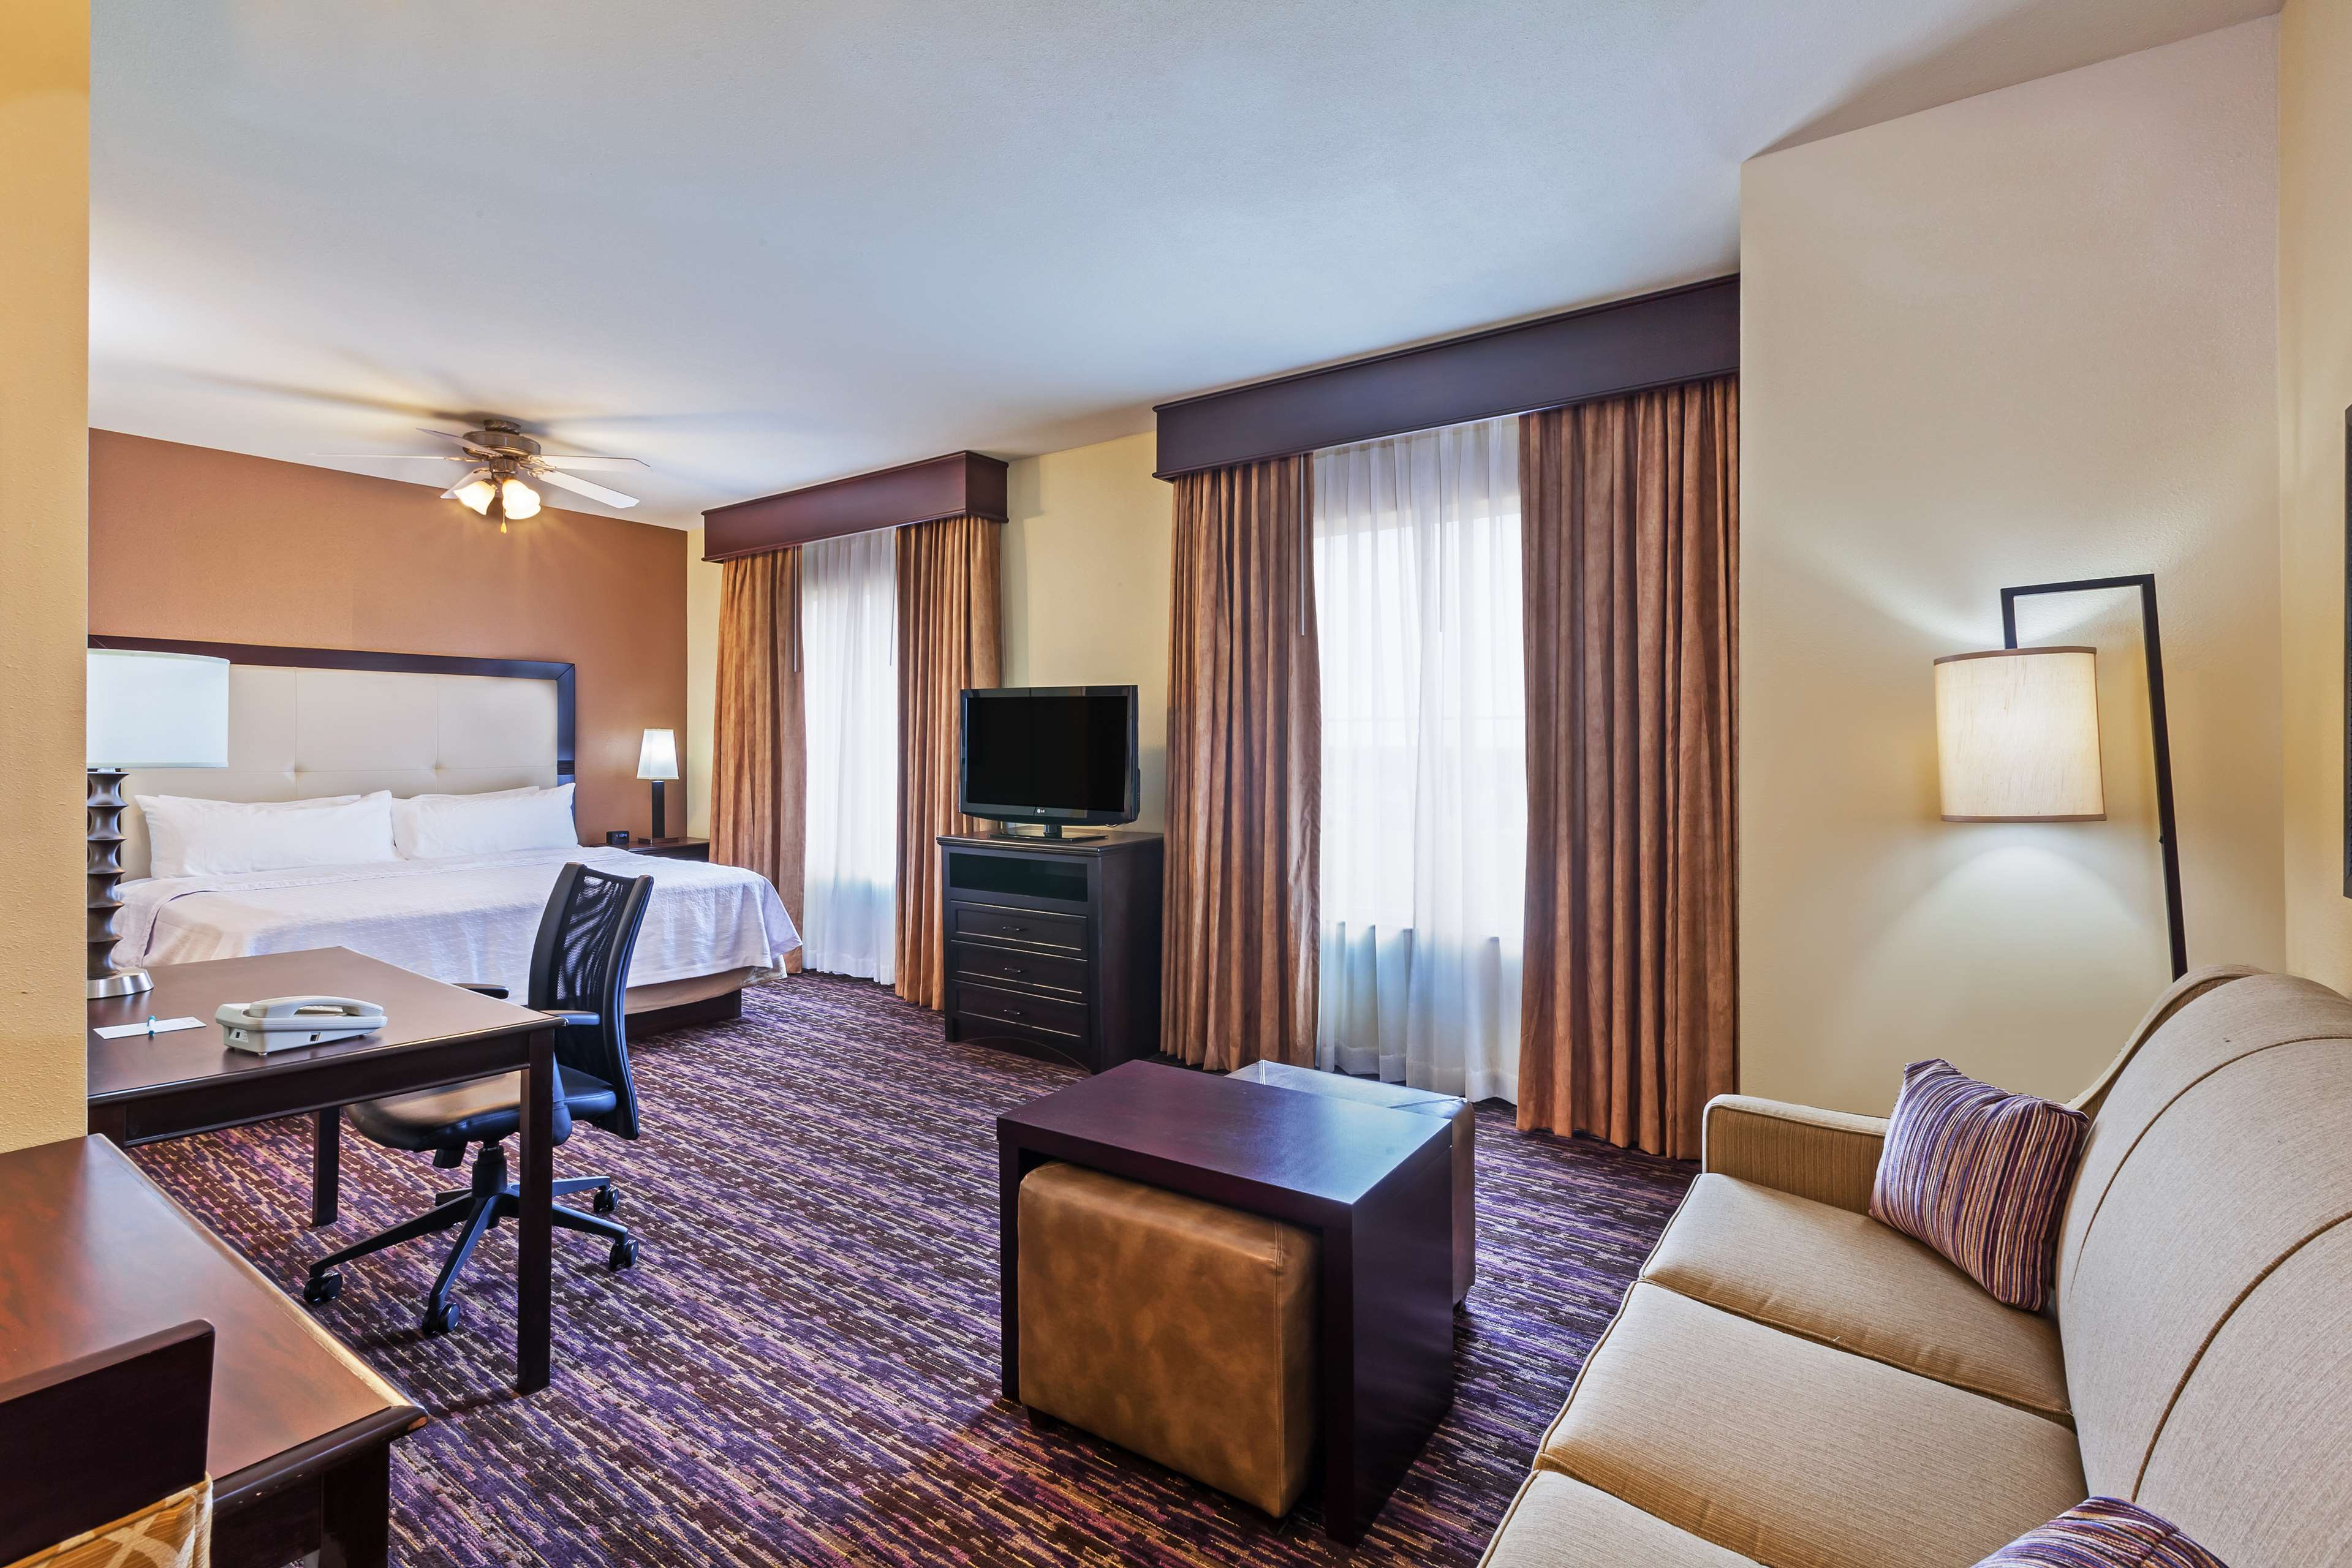 Homewood Suites by Hilton Wichita Falls image 17